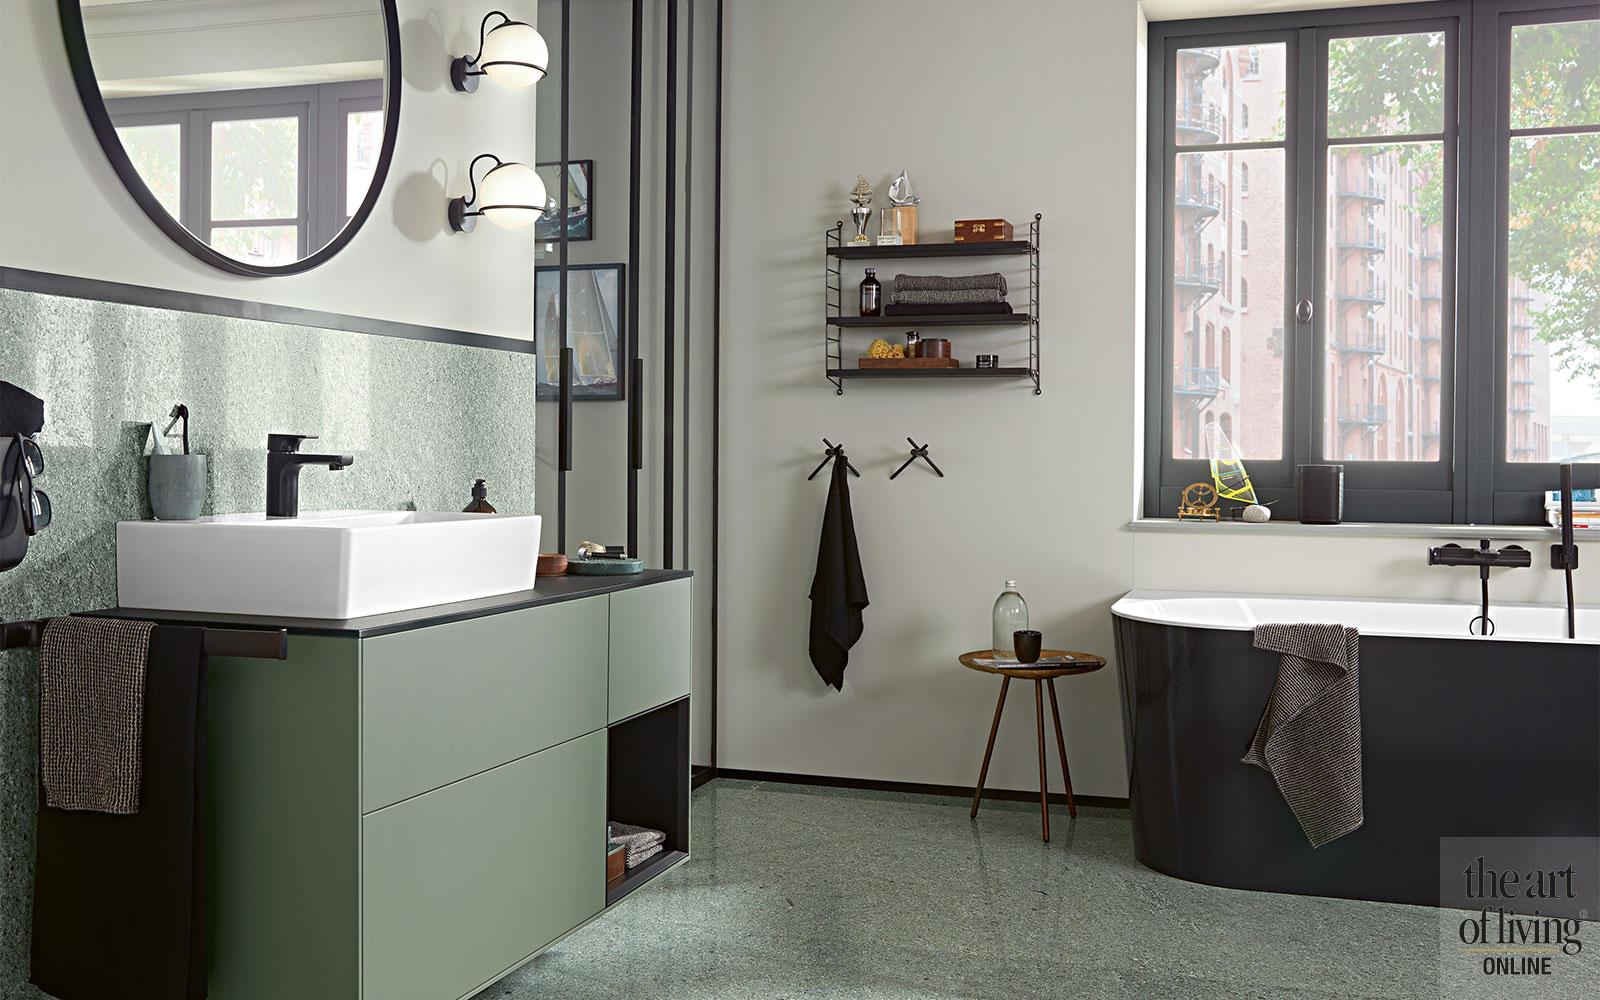 urban look, villeroy & boch, badkamers, badkamerinspiratie, urban, modern